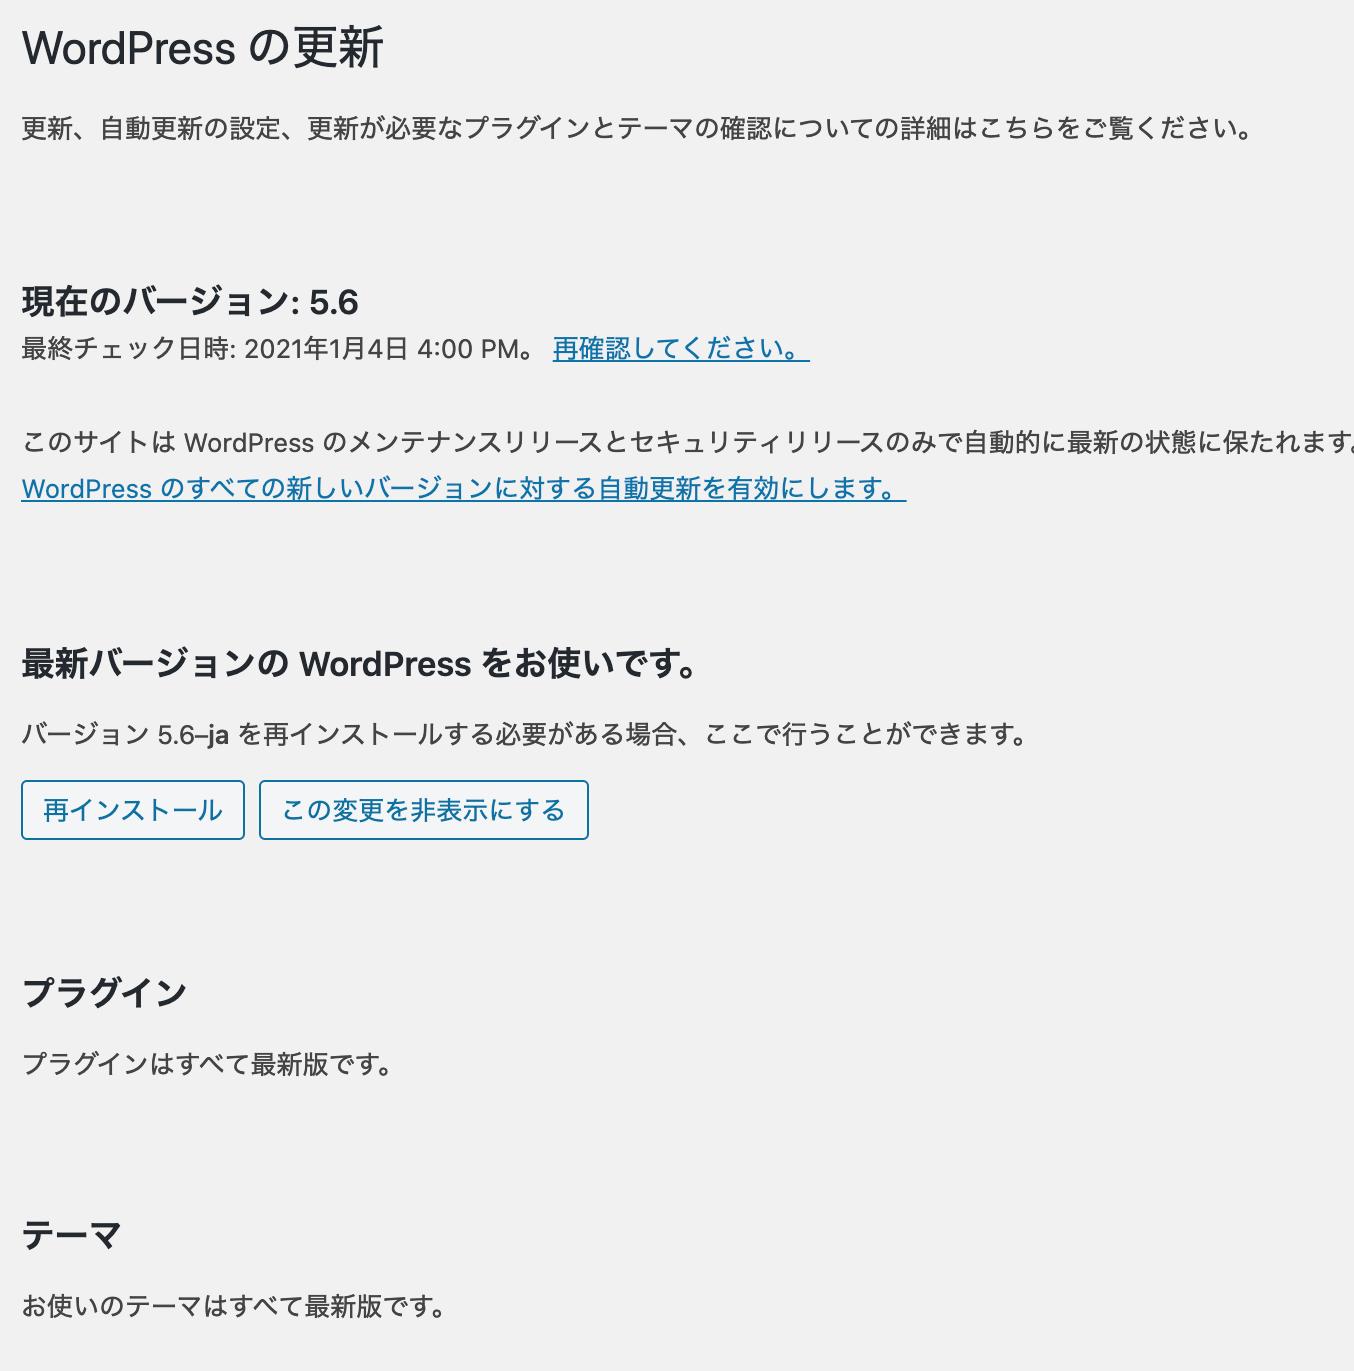 WordPressの更新画面。プラグイン・テーマ・WordPress本体が全て最新の状態になっていることを確認して完了